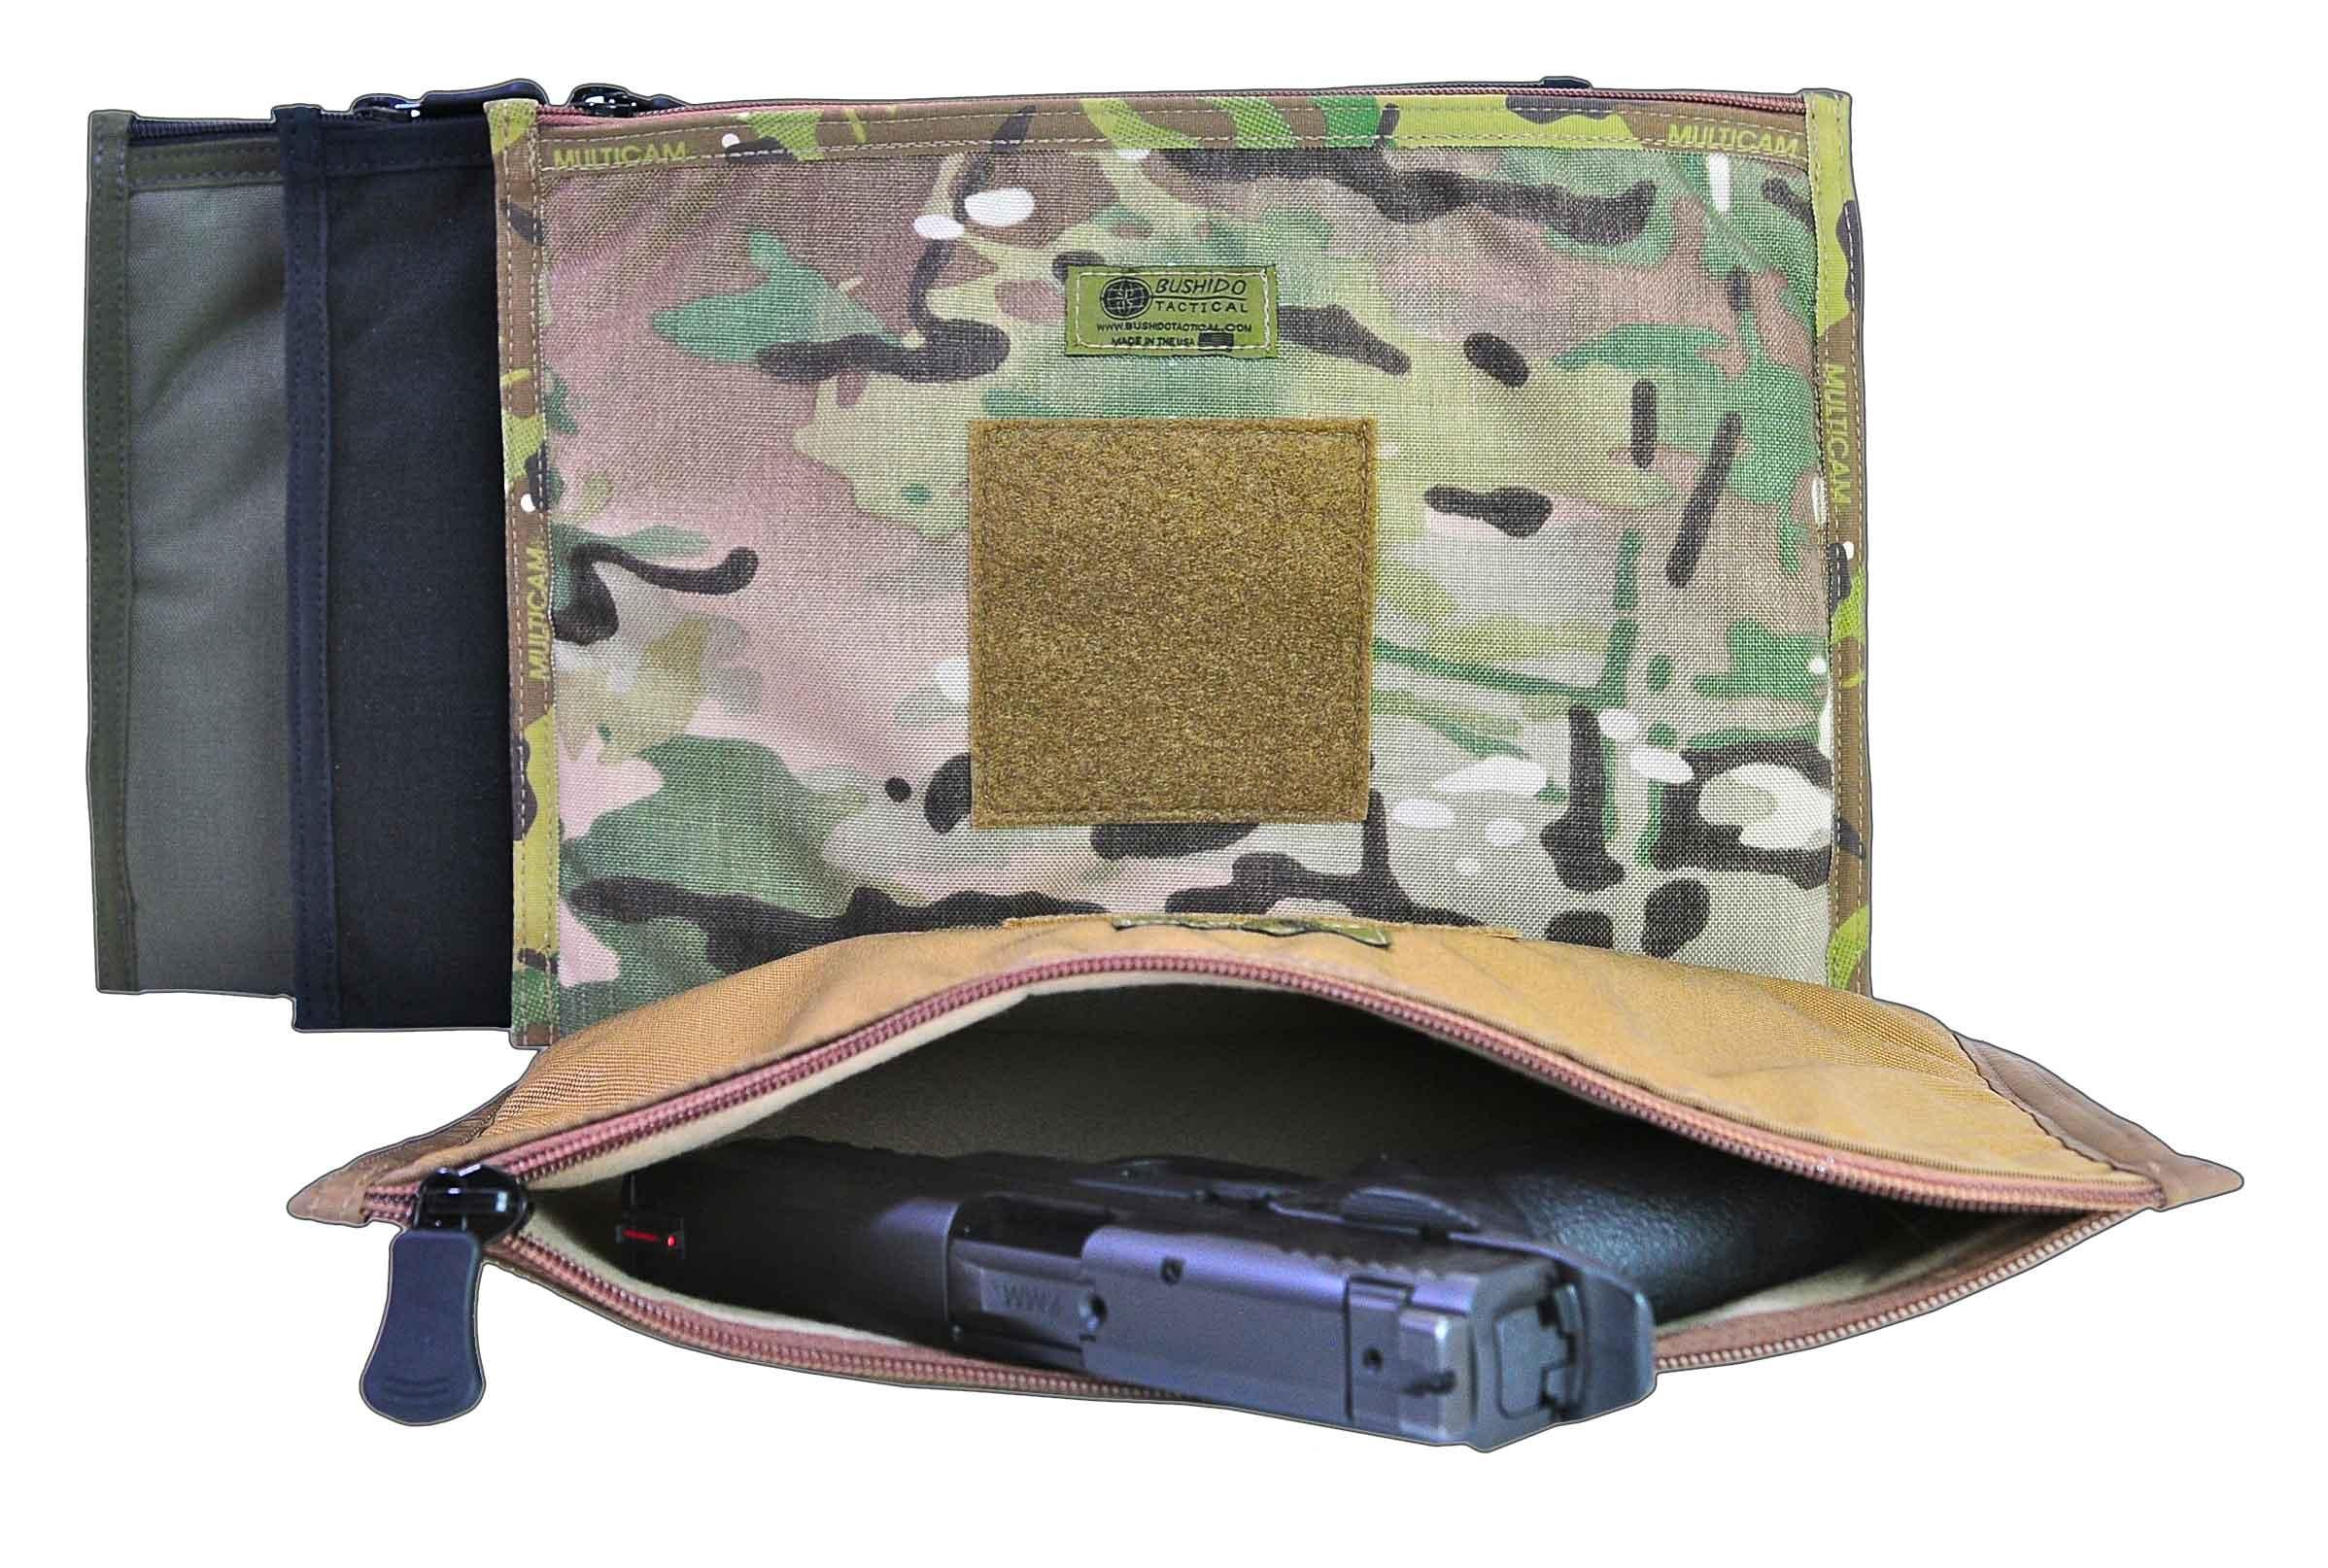 Pistol Caddy Case